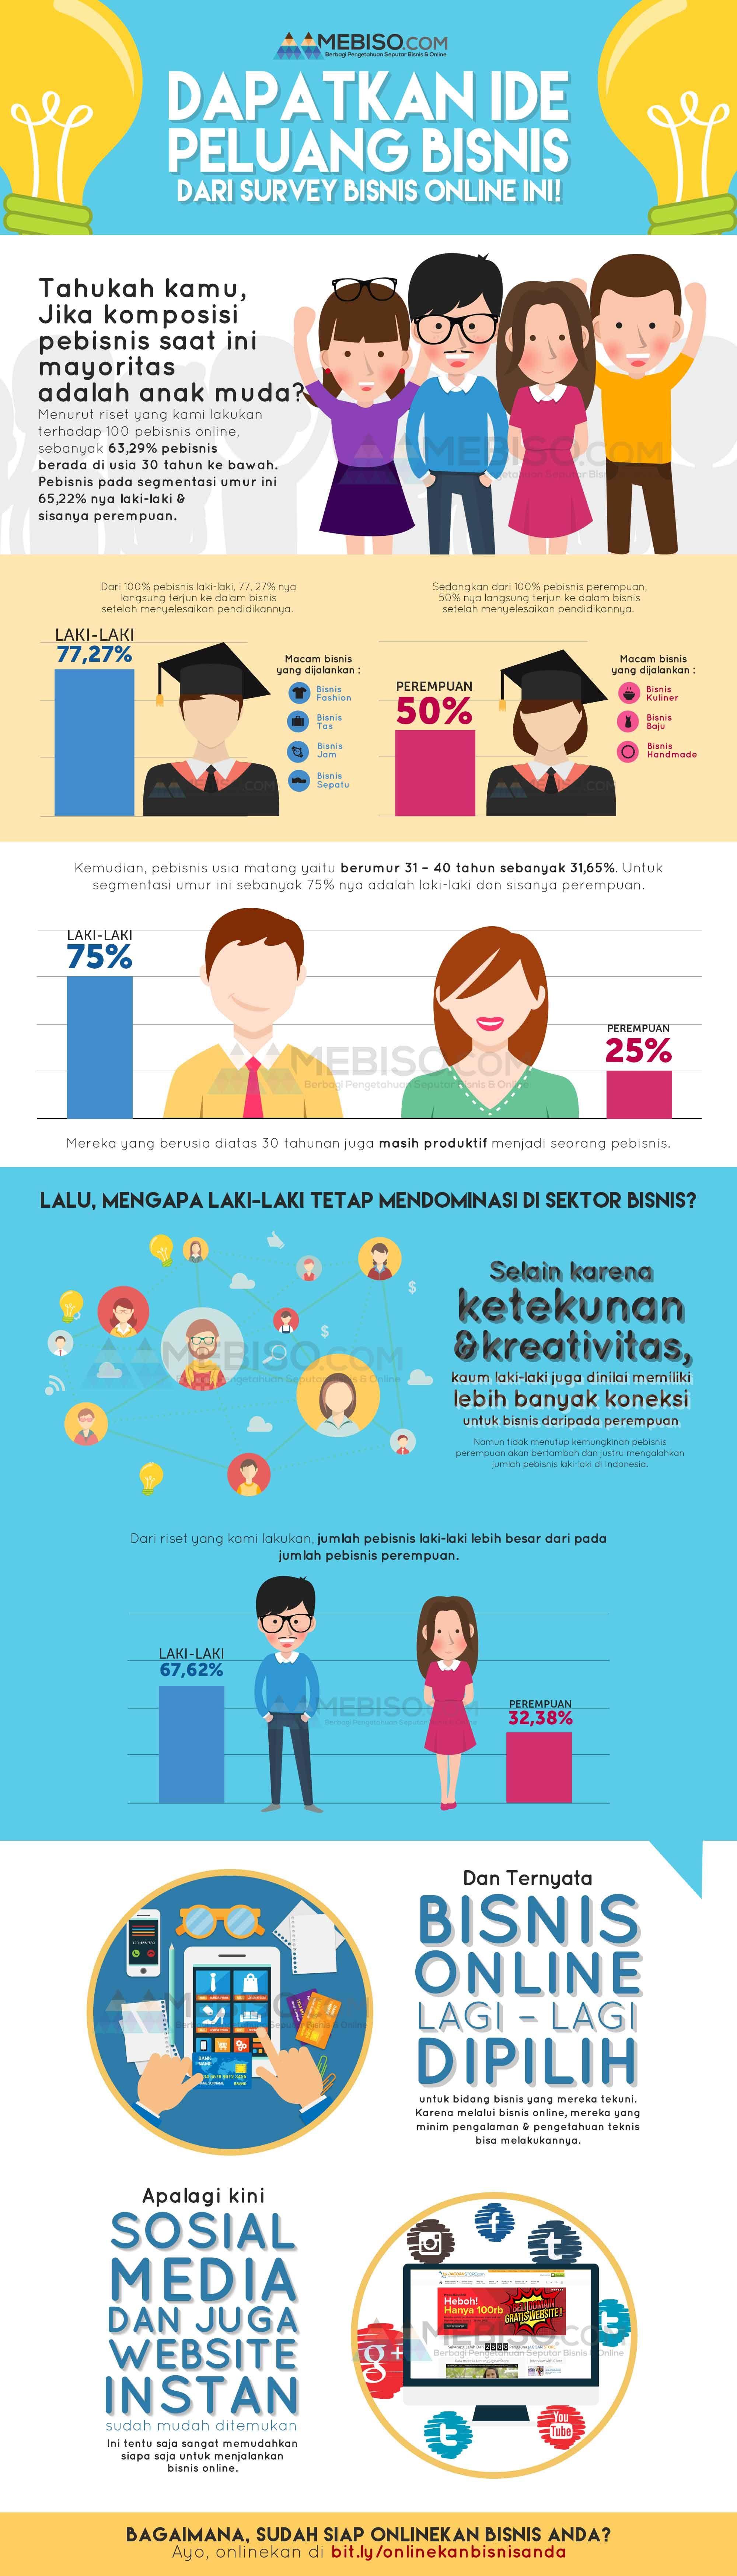 Ide Peluang Bisnis #bisnis #business #infographic #online ...